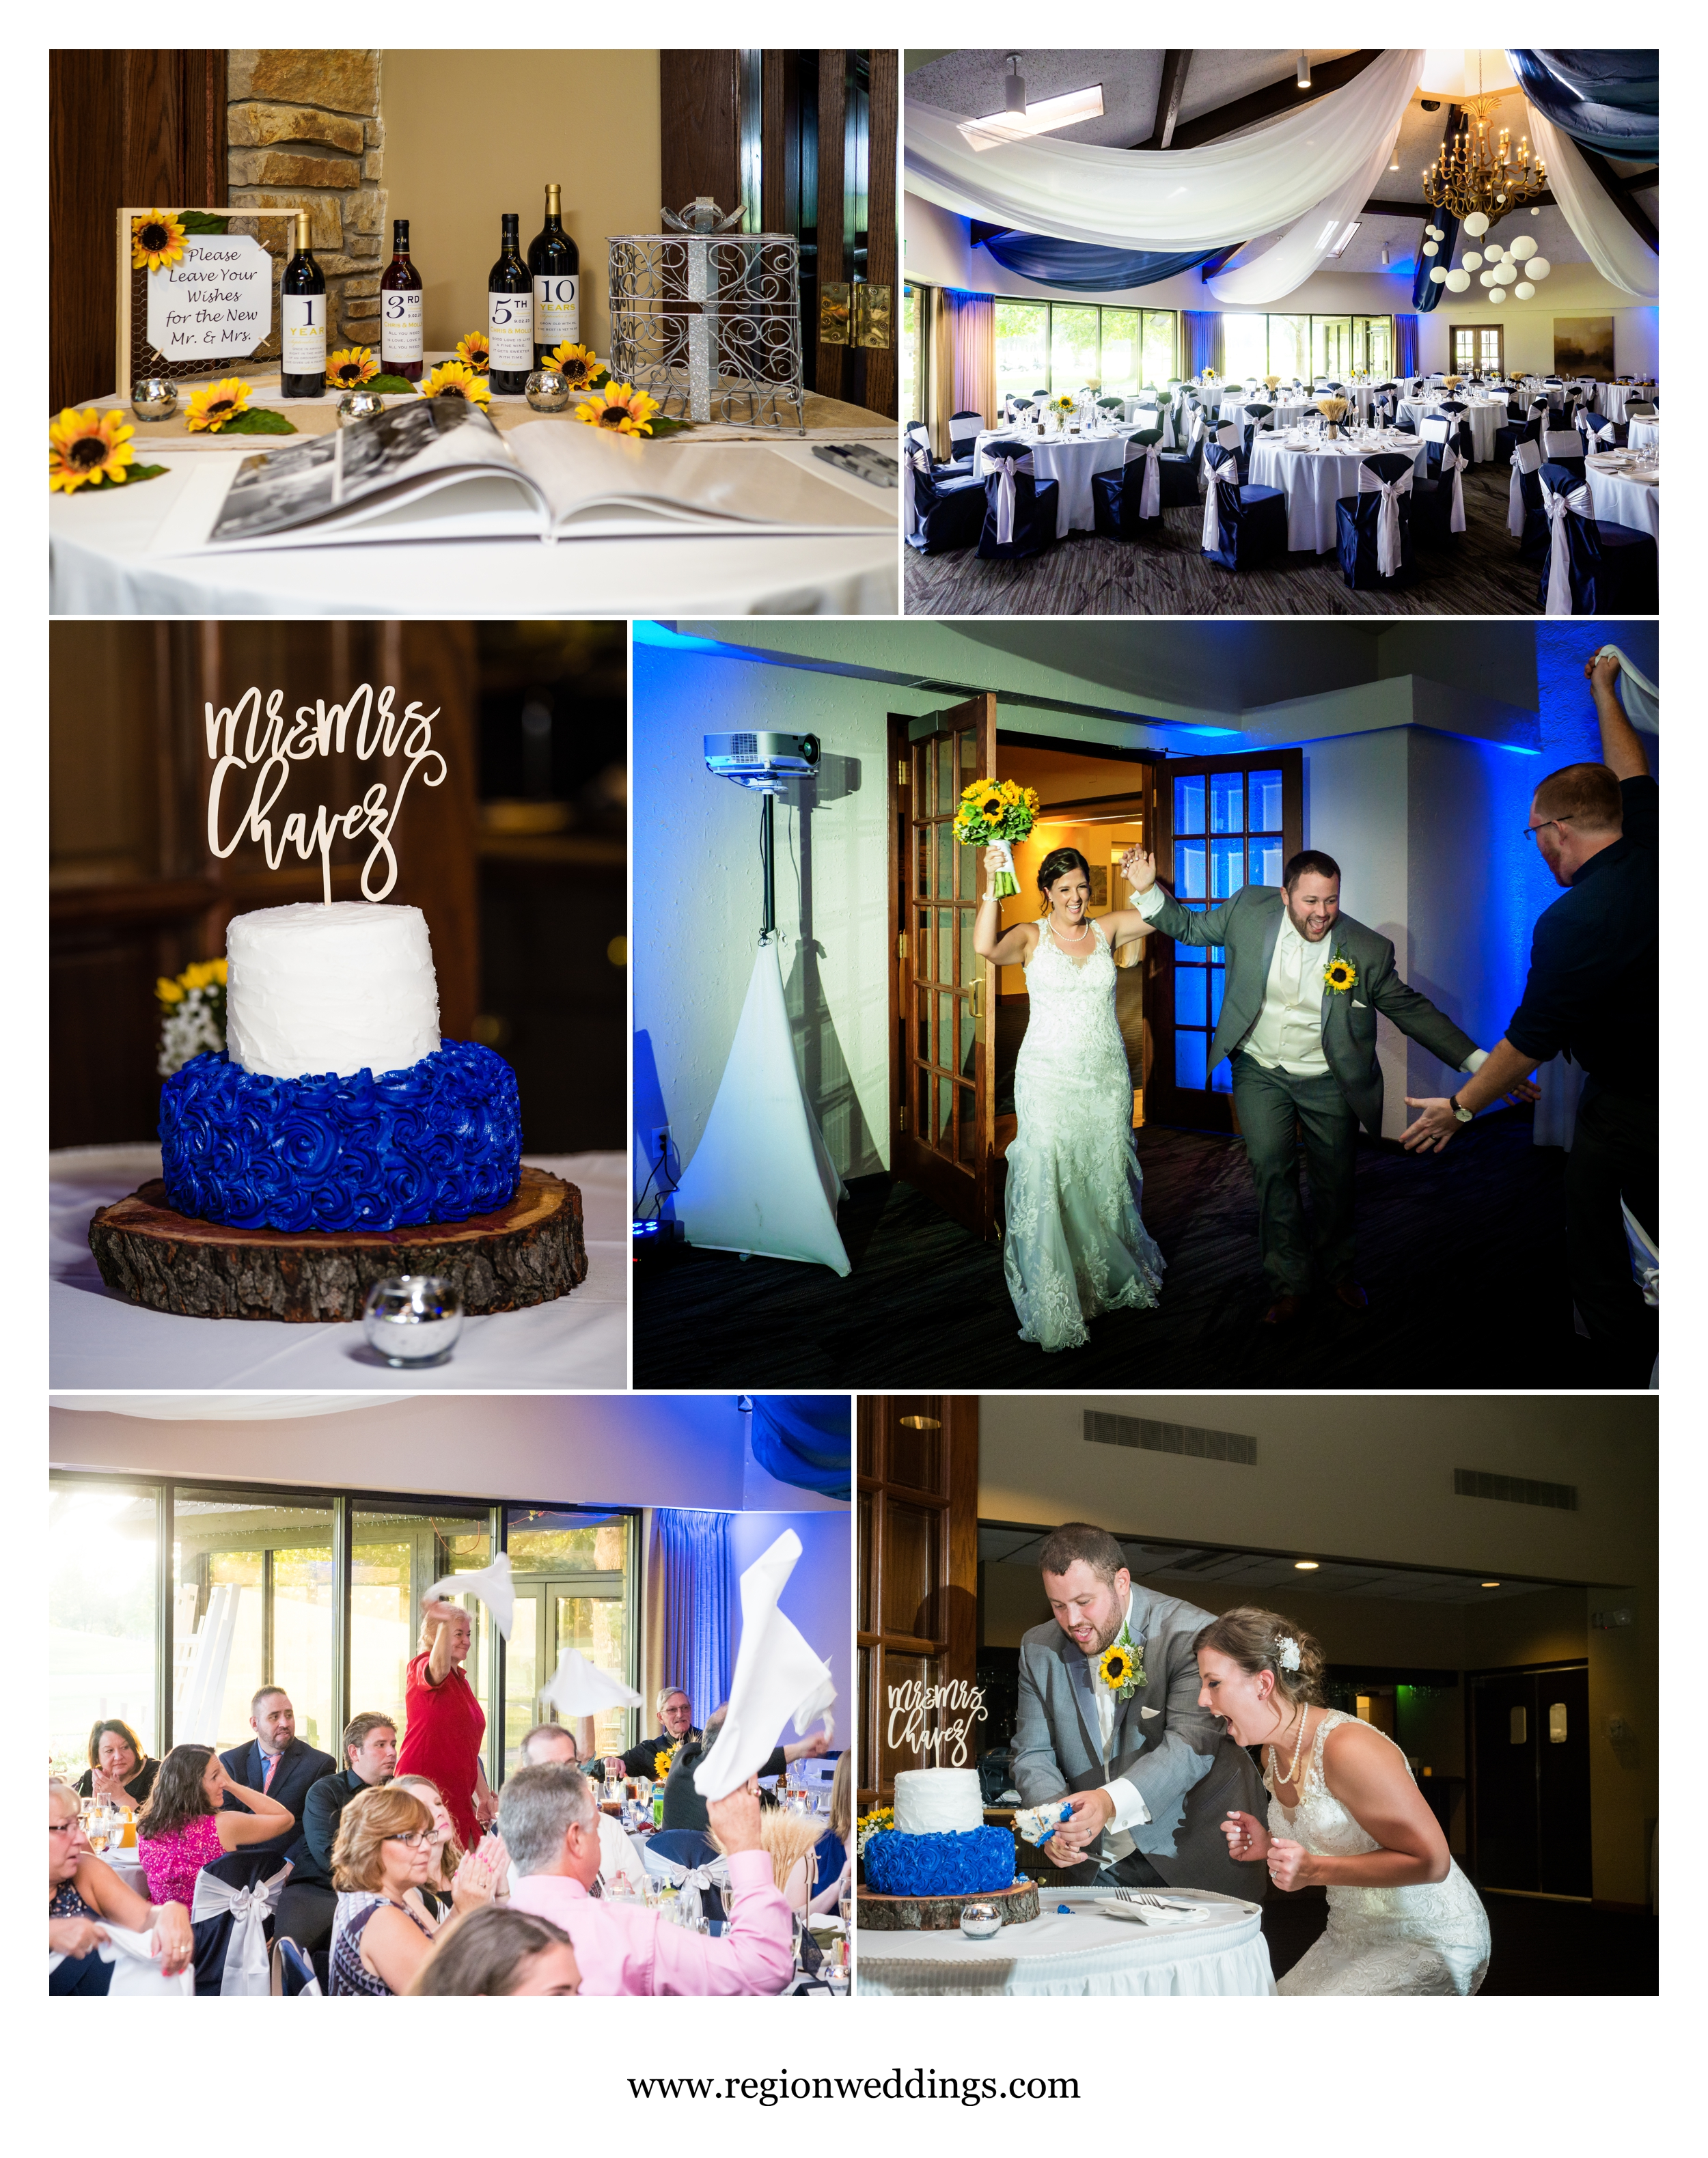 Wedding reception decor at Briar Ridge in Dyer, Indiana.